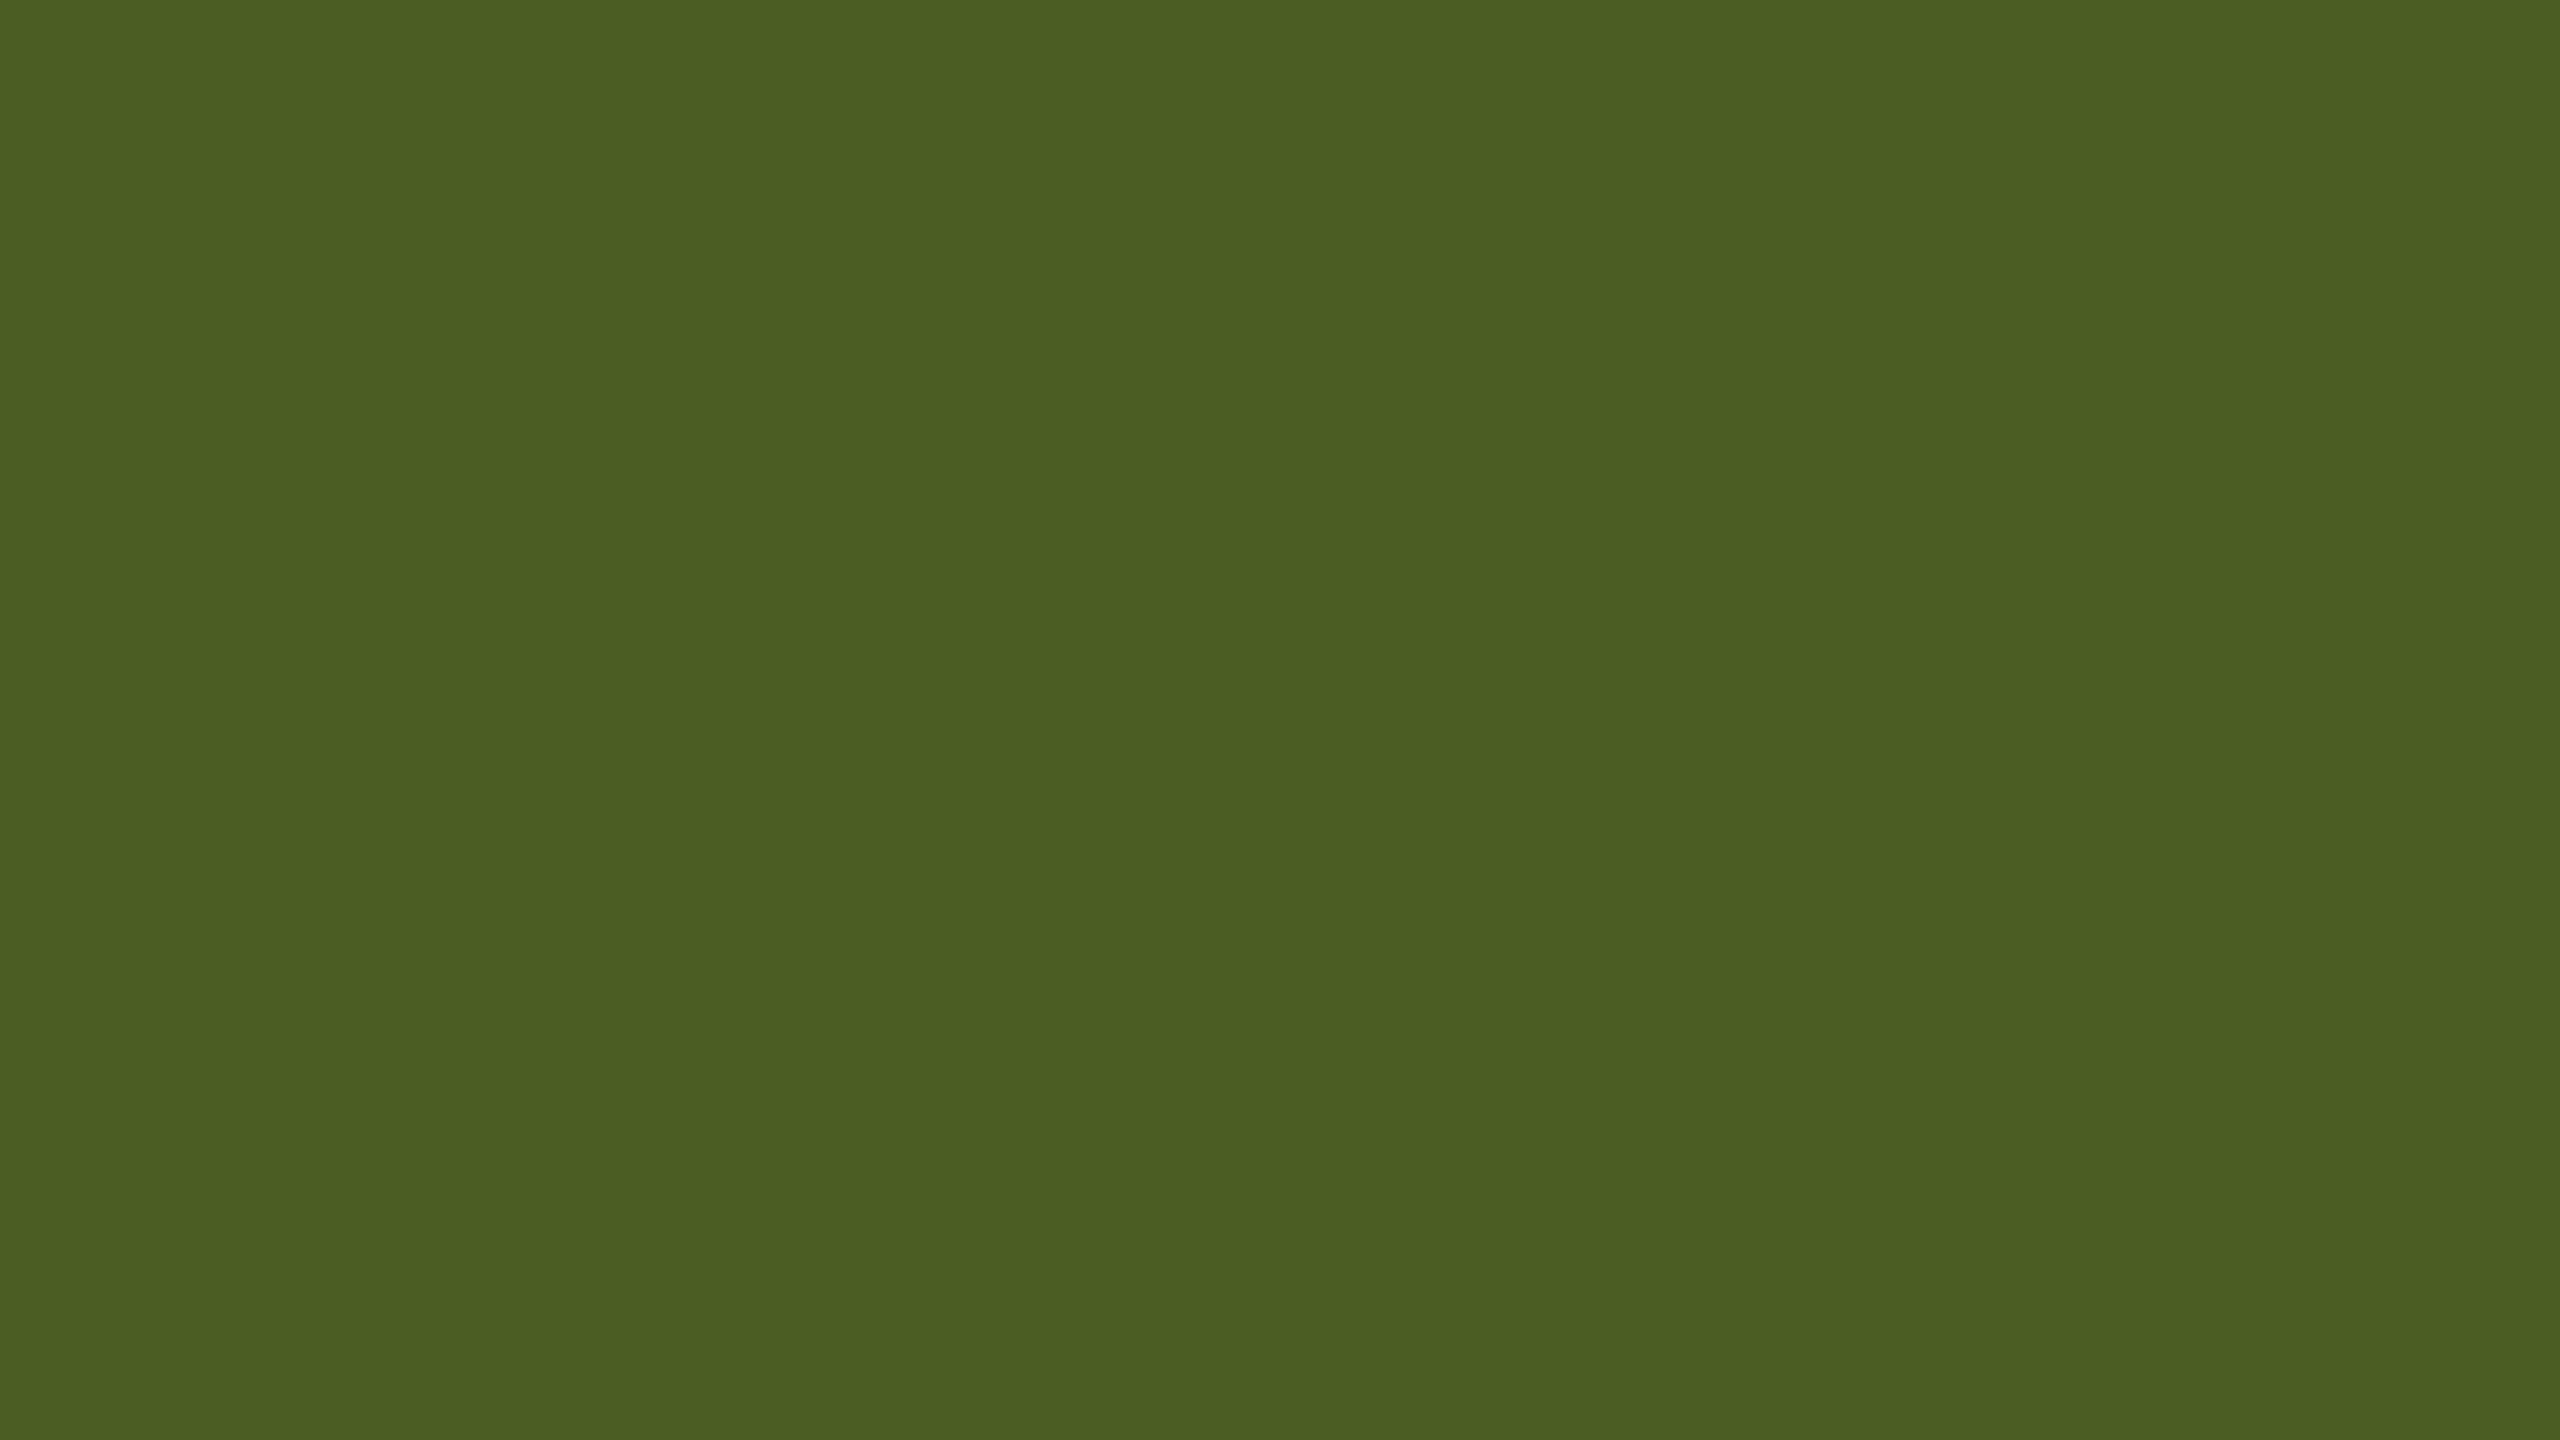 resolution dark moss green - photo #4